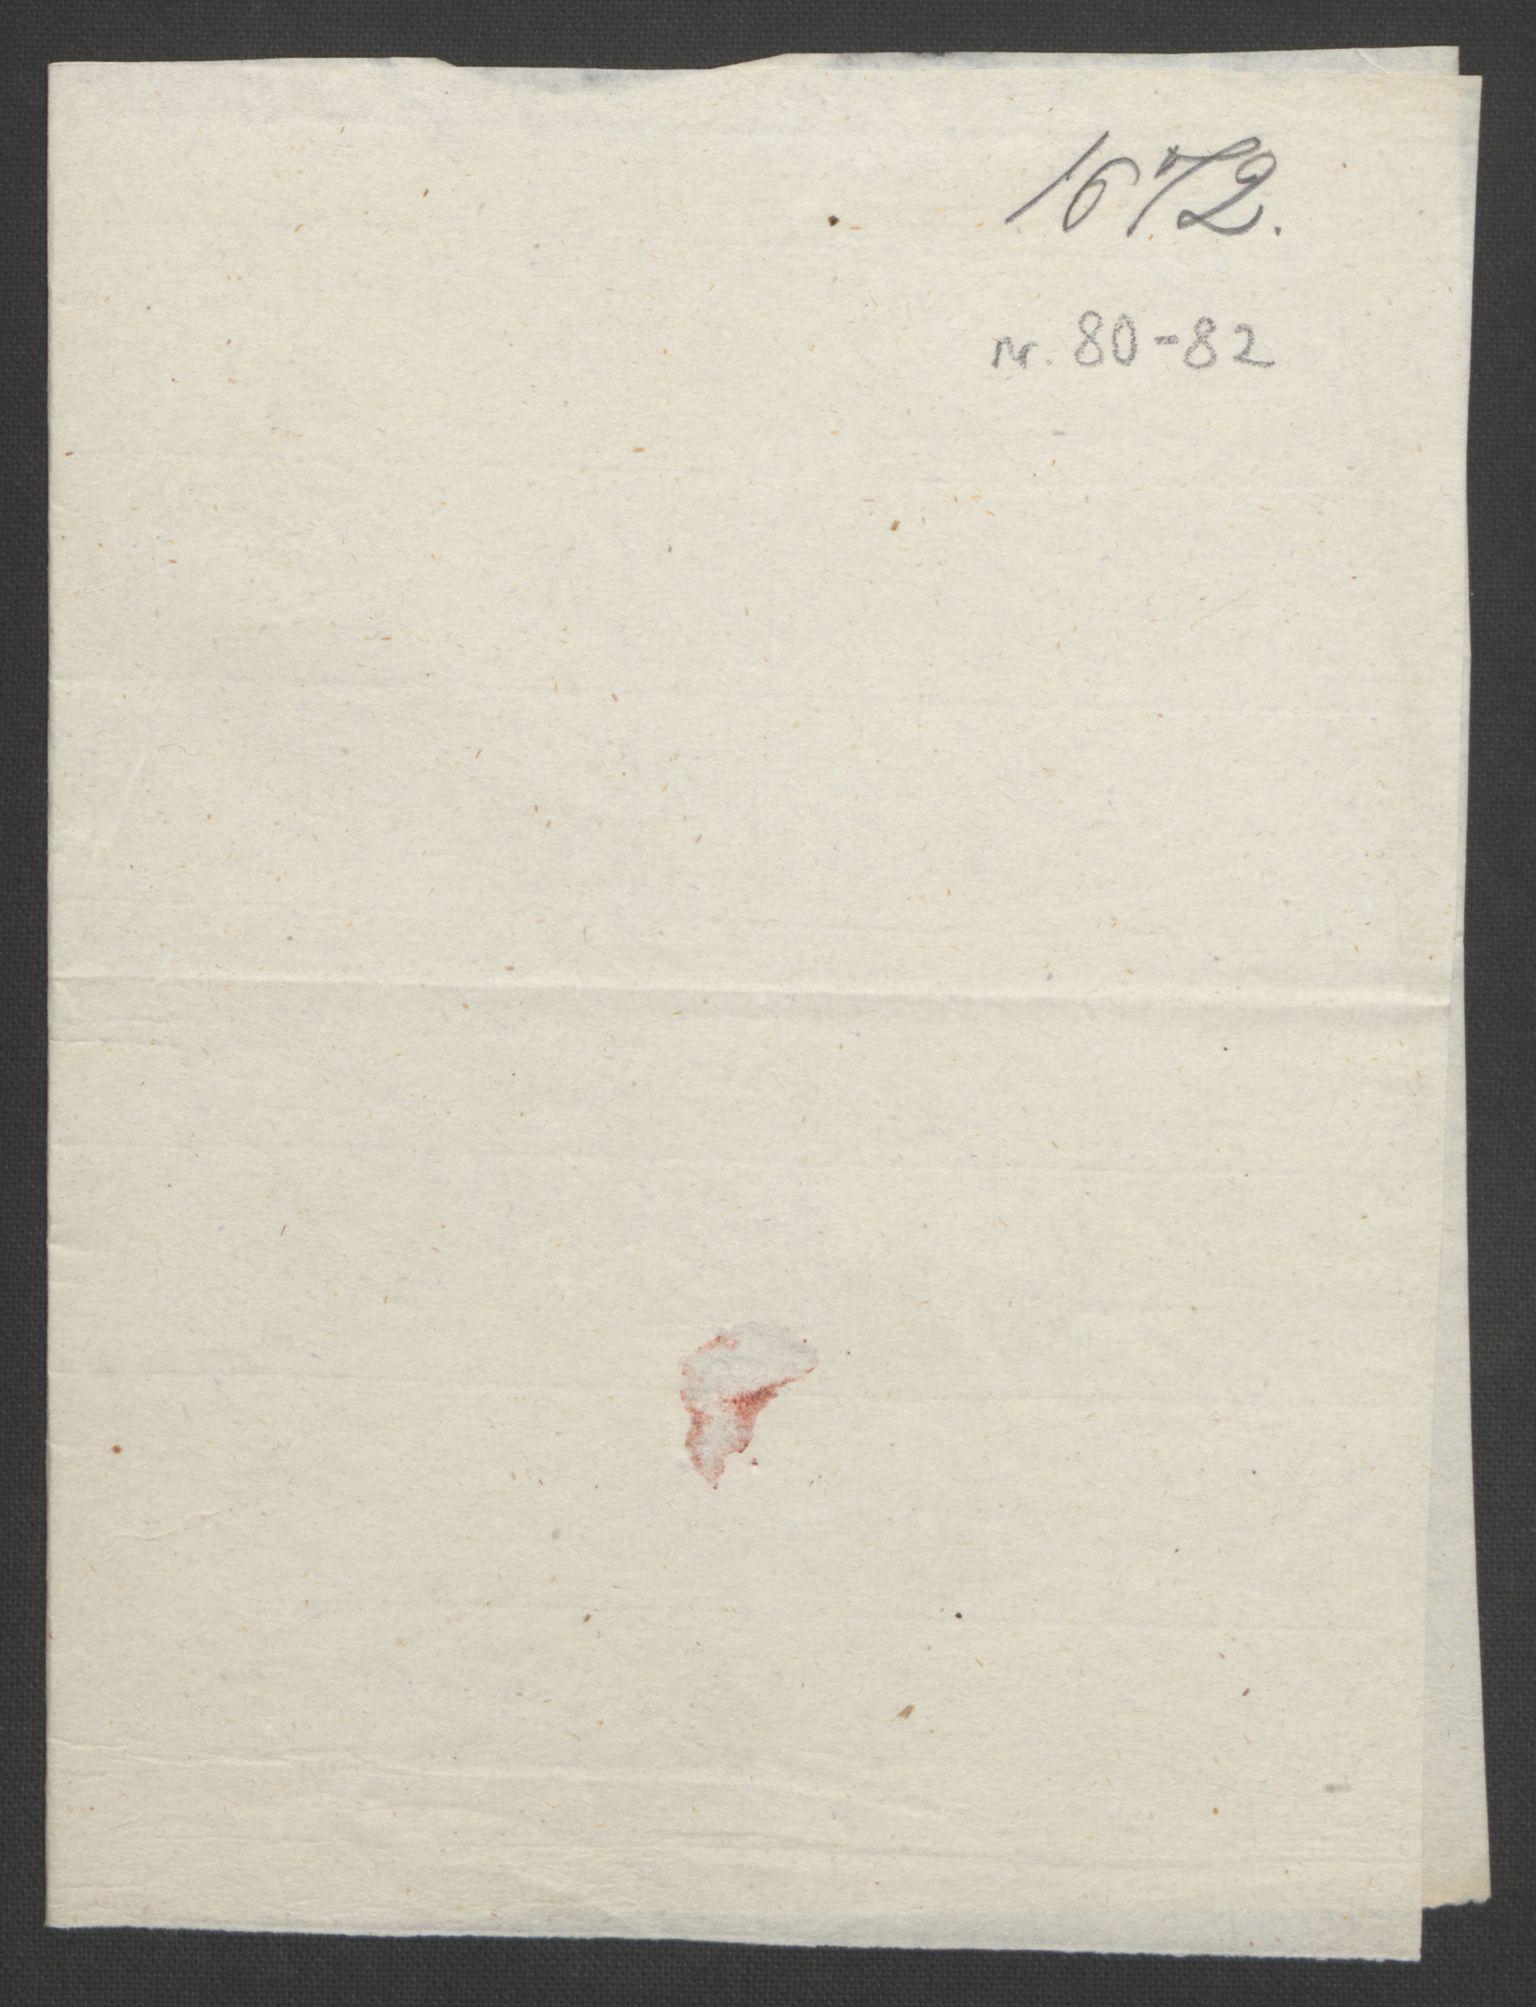 RA, Rentekammeret inntil 1814, Reviderte regnskaper, Fogderegnskap, R32/L1842: Fogderegnskap Jarlsberg grevskap, 1664-1673, s. 209